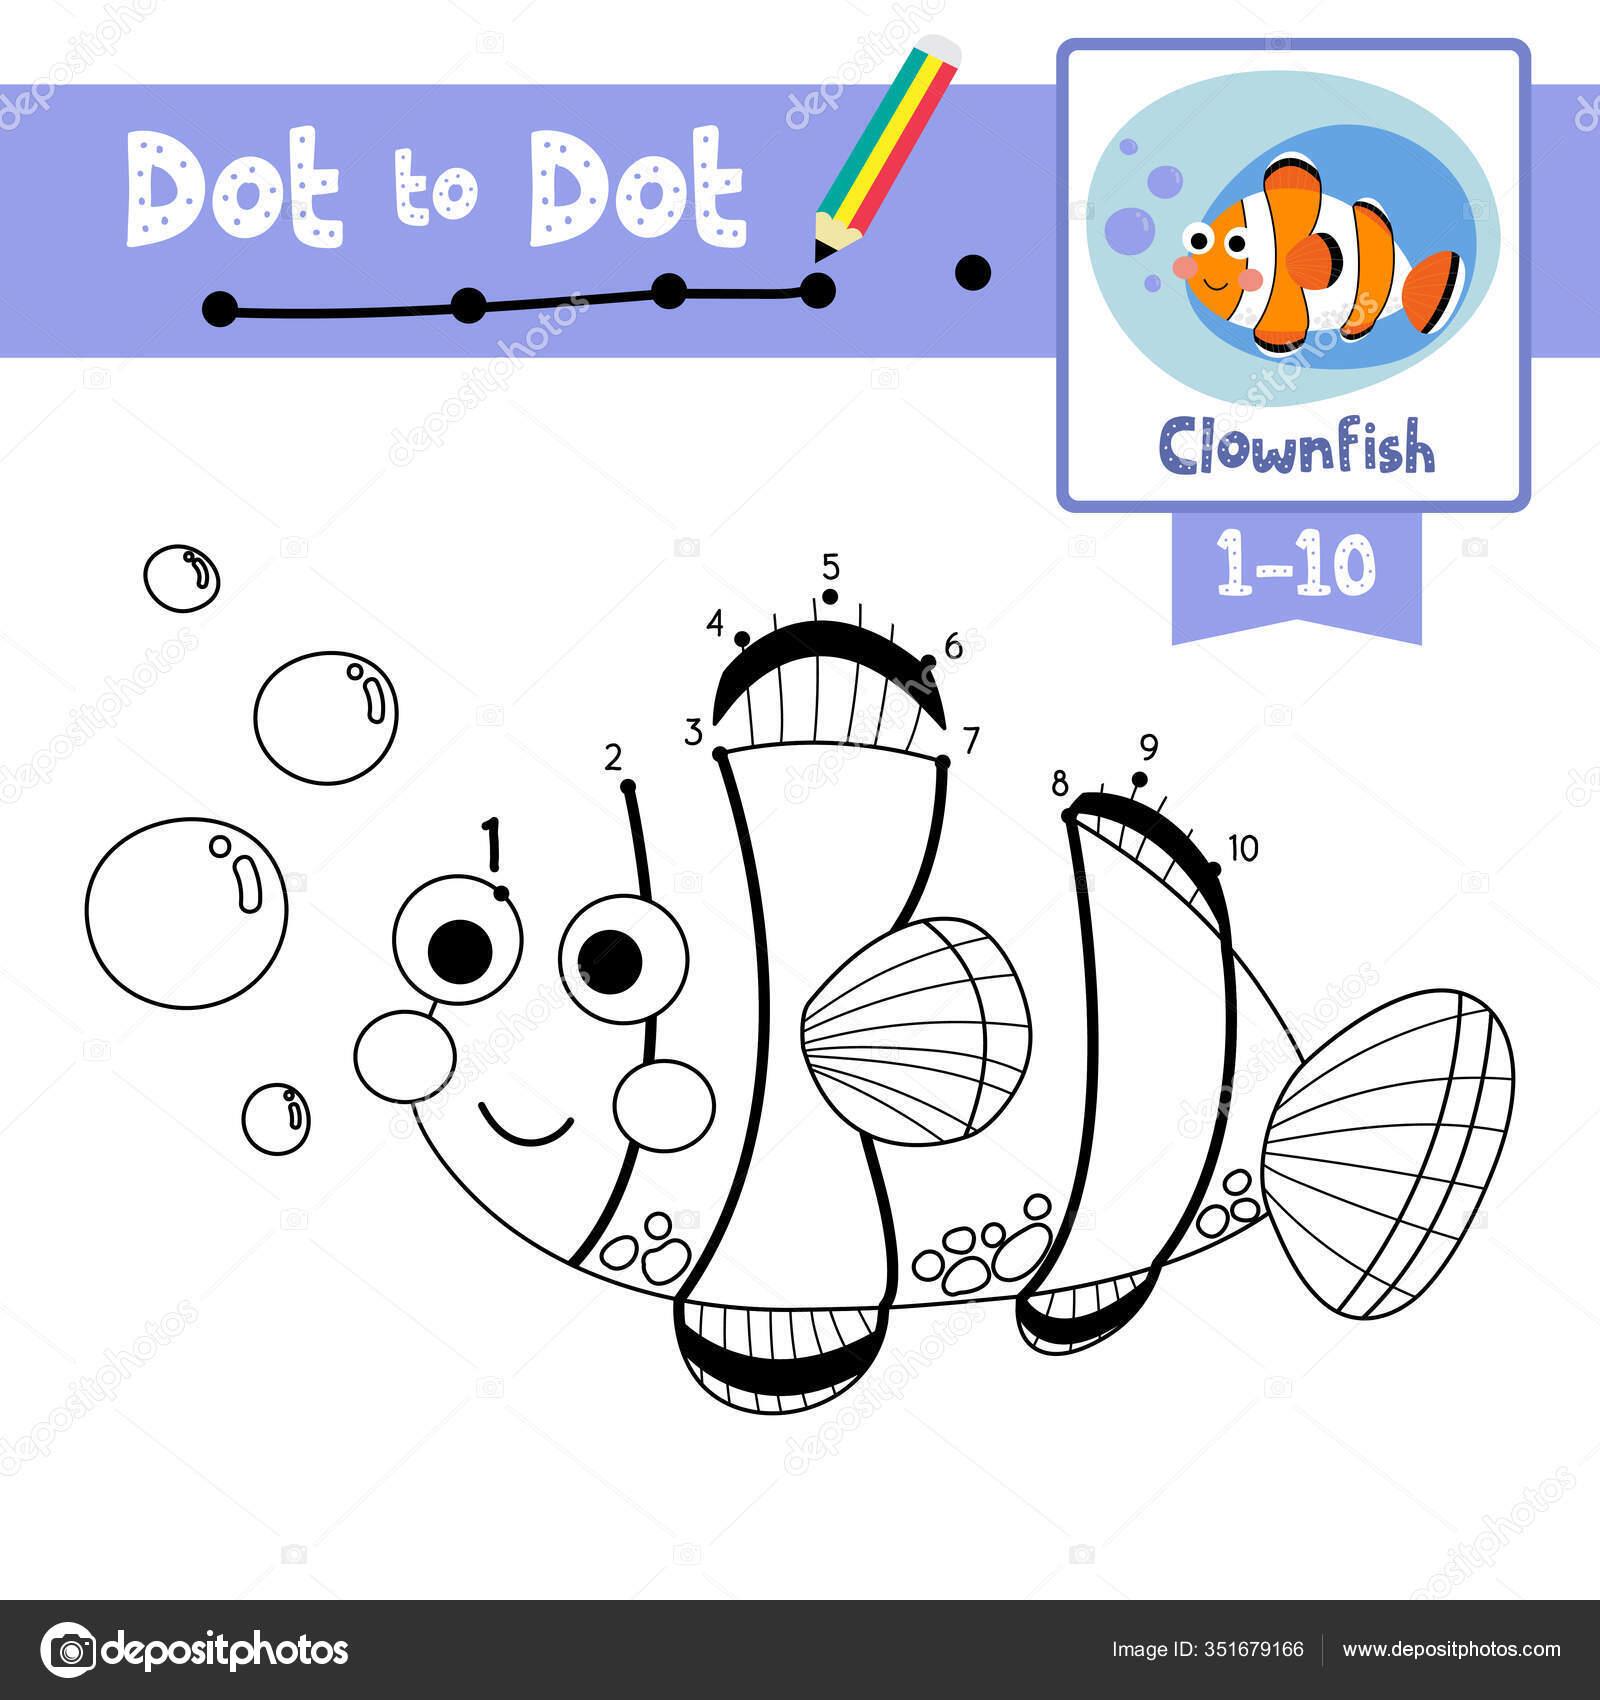 Dot Dot Educational Game Coloring Book Happy Clownfish